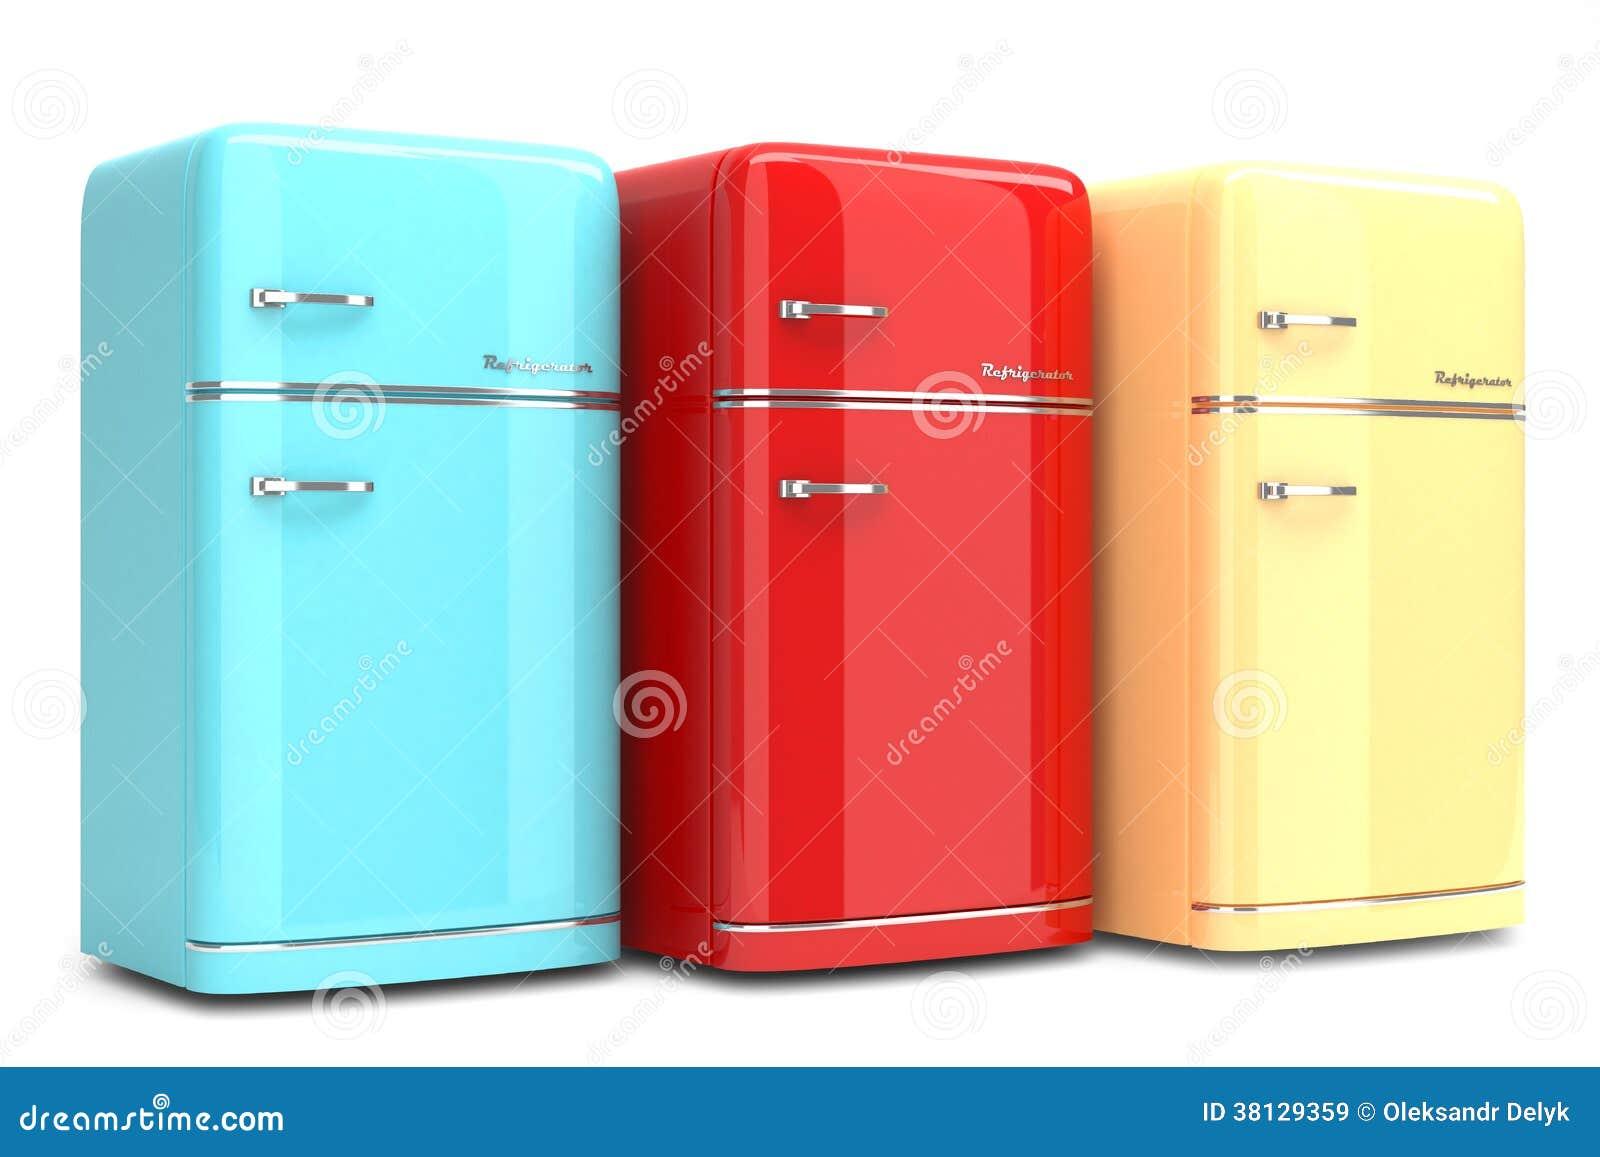 Kühlschränke Retro | zanzibor.com